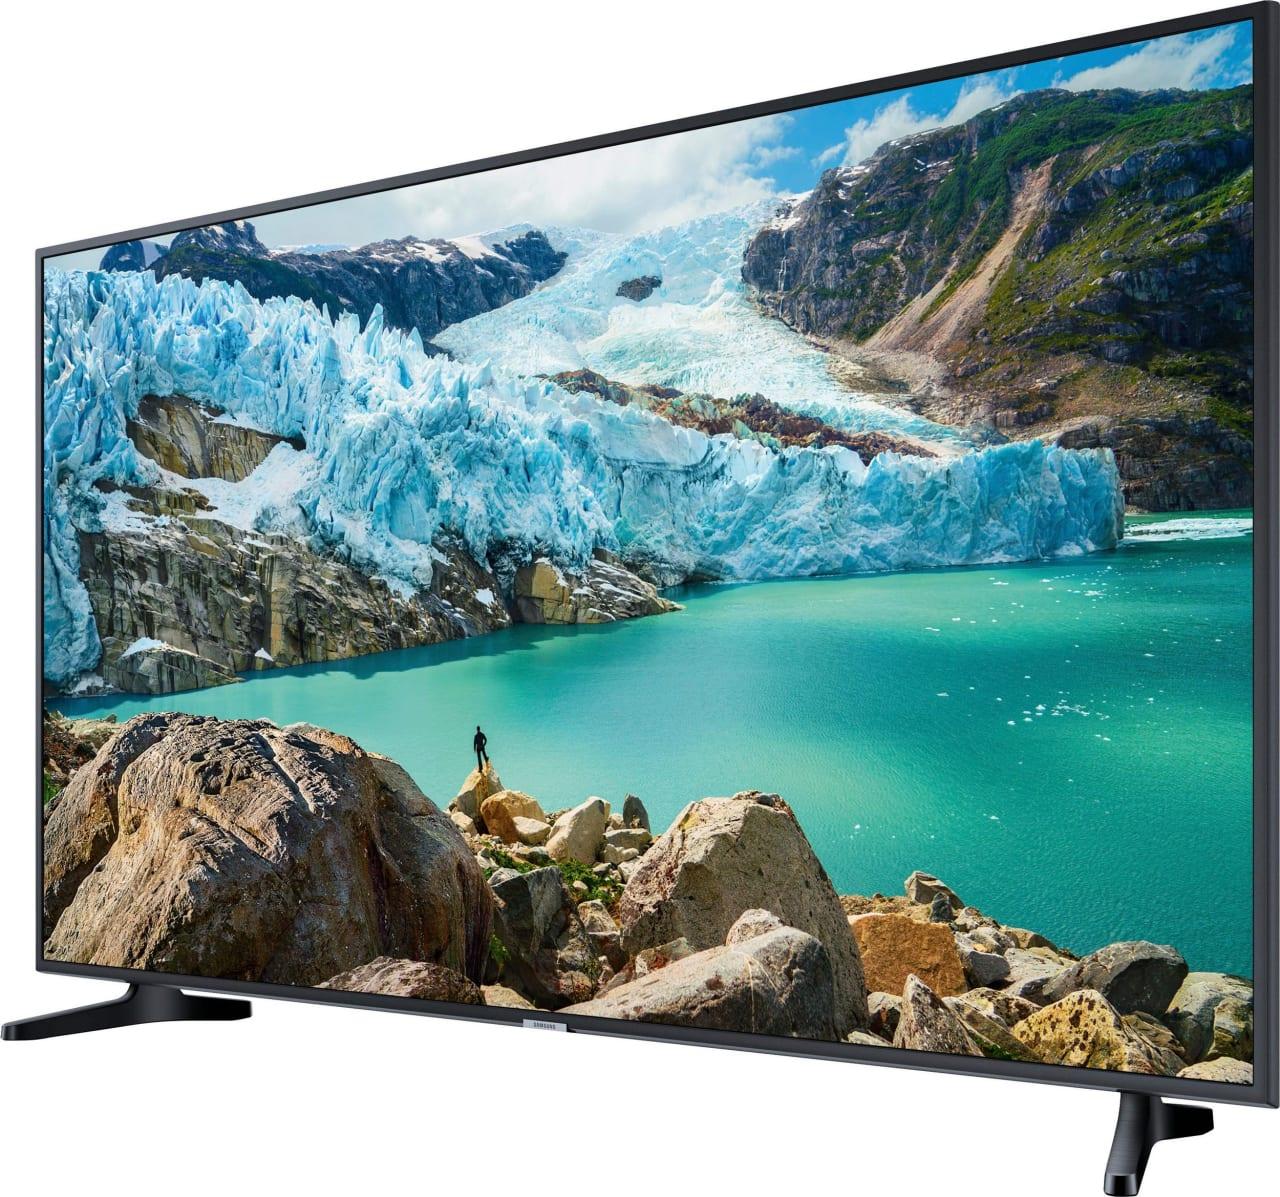 "Black Samsung TV 55"" RU7099.2"